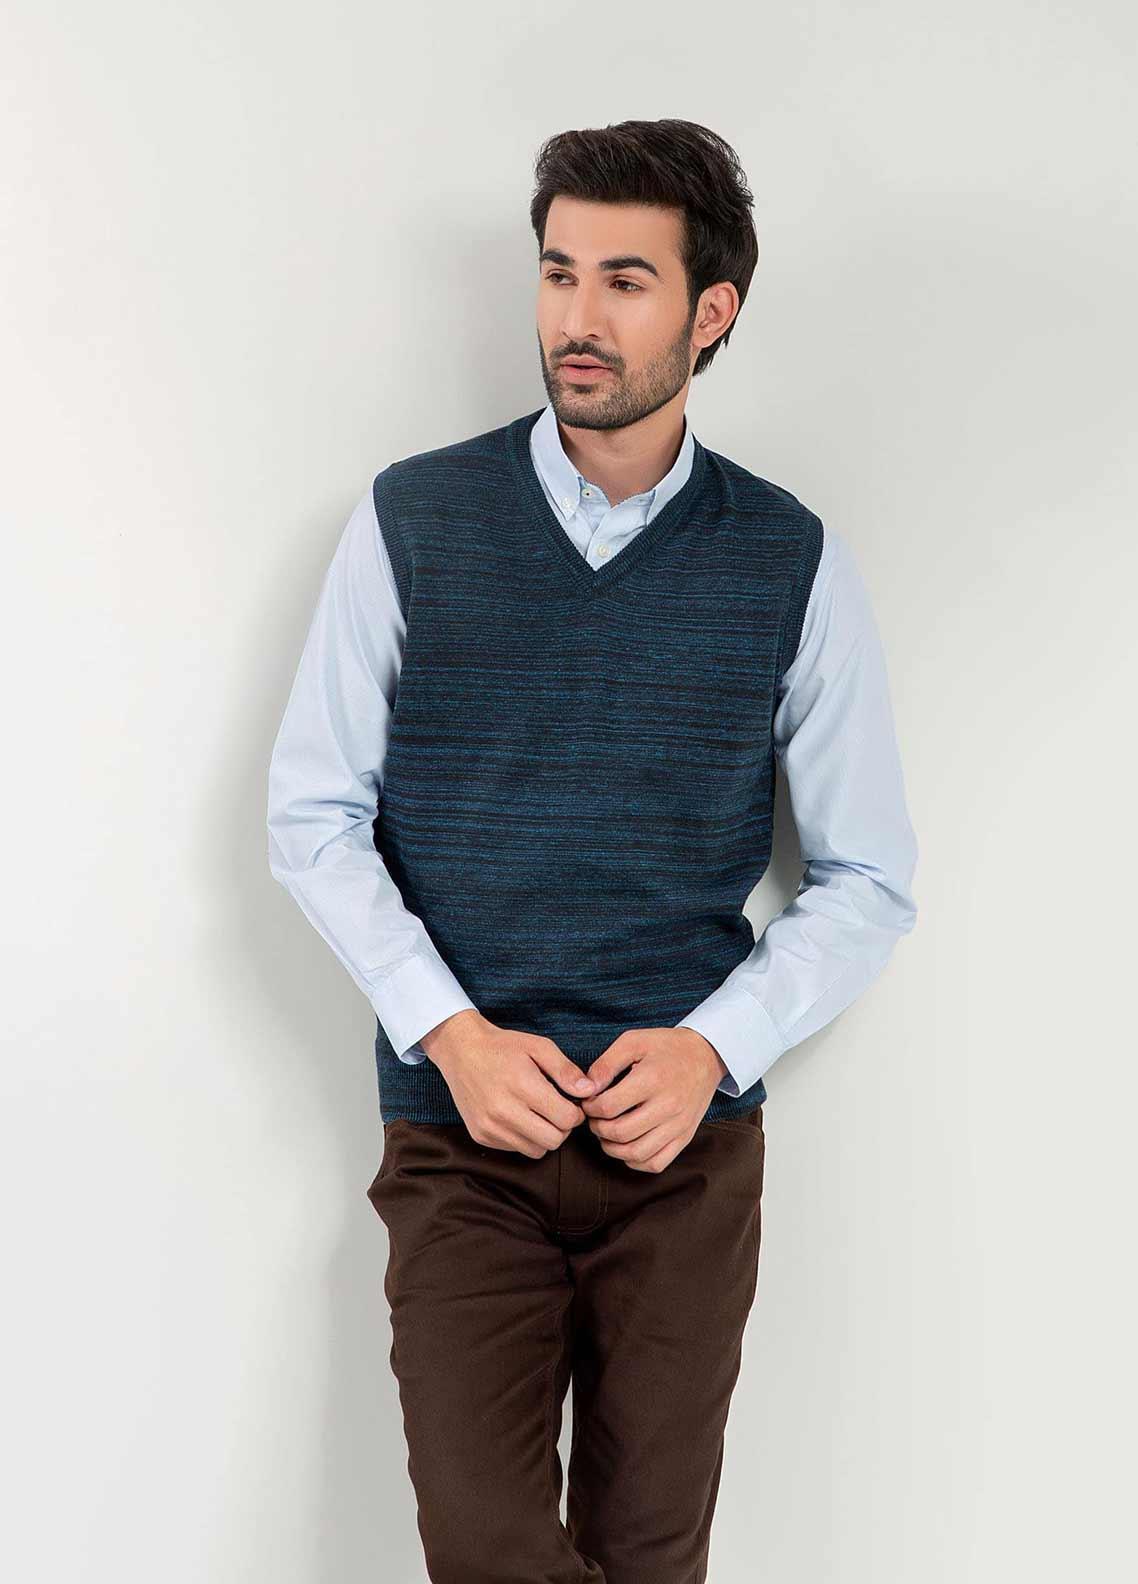 Brumano Cotton Sleeveless Men Sweaters -  BM20WS Navy Blue Patterned Sleeveless V-Neck Sweater